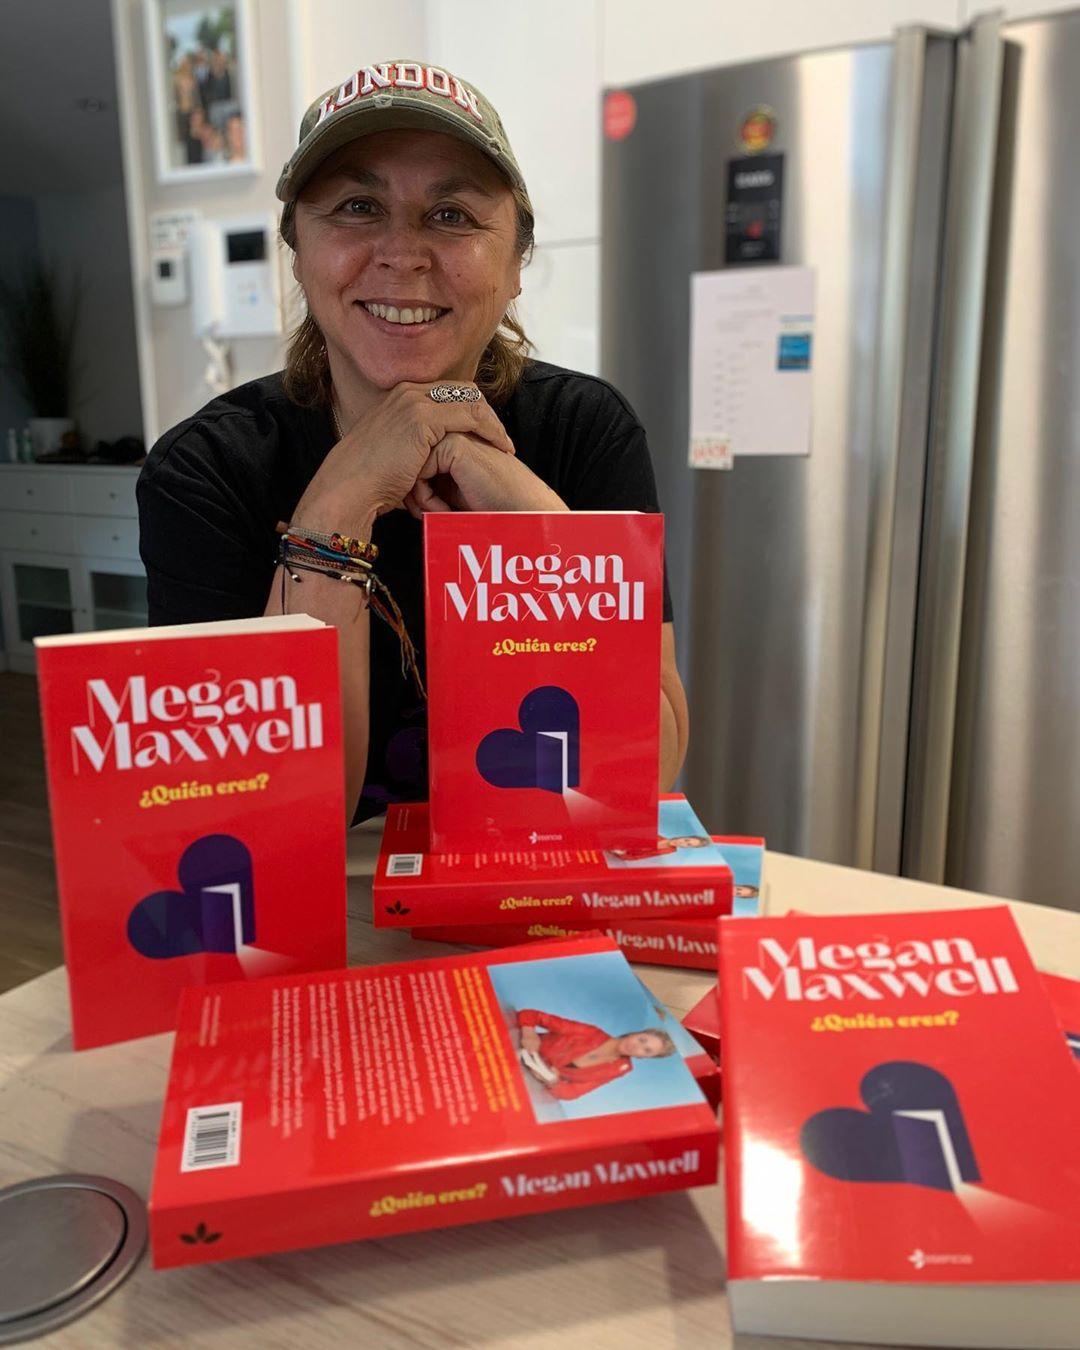 Sorteo nacional. Consigue tu libro firmado por Megan Maxwell ¡Participa!